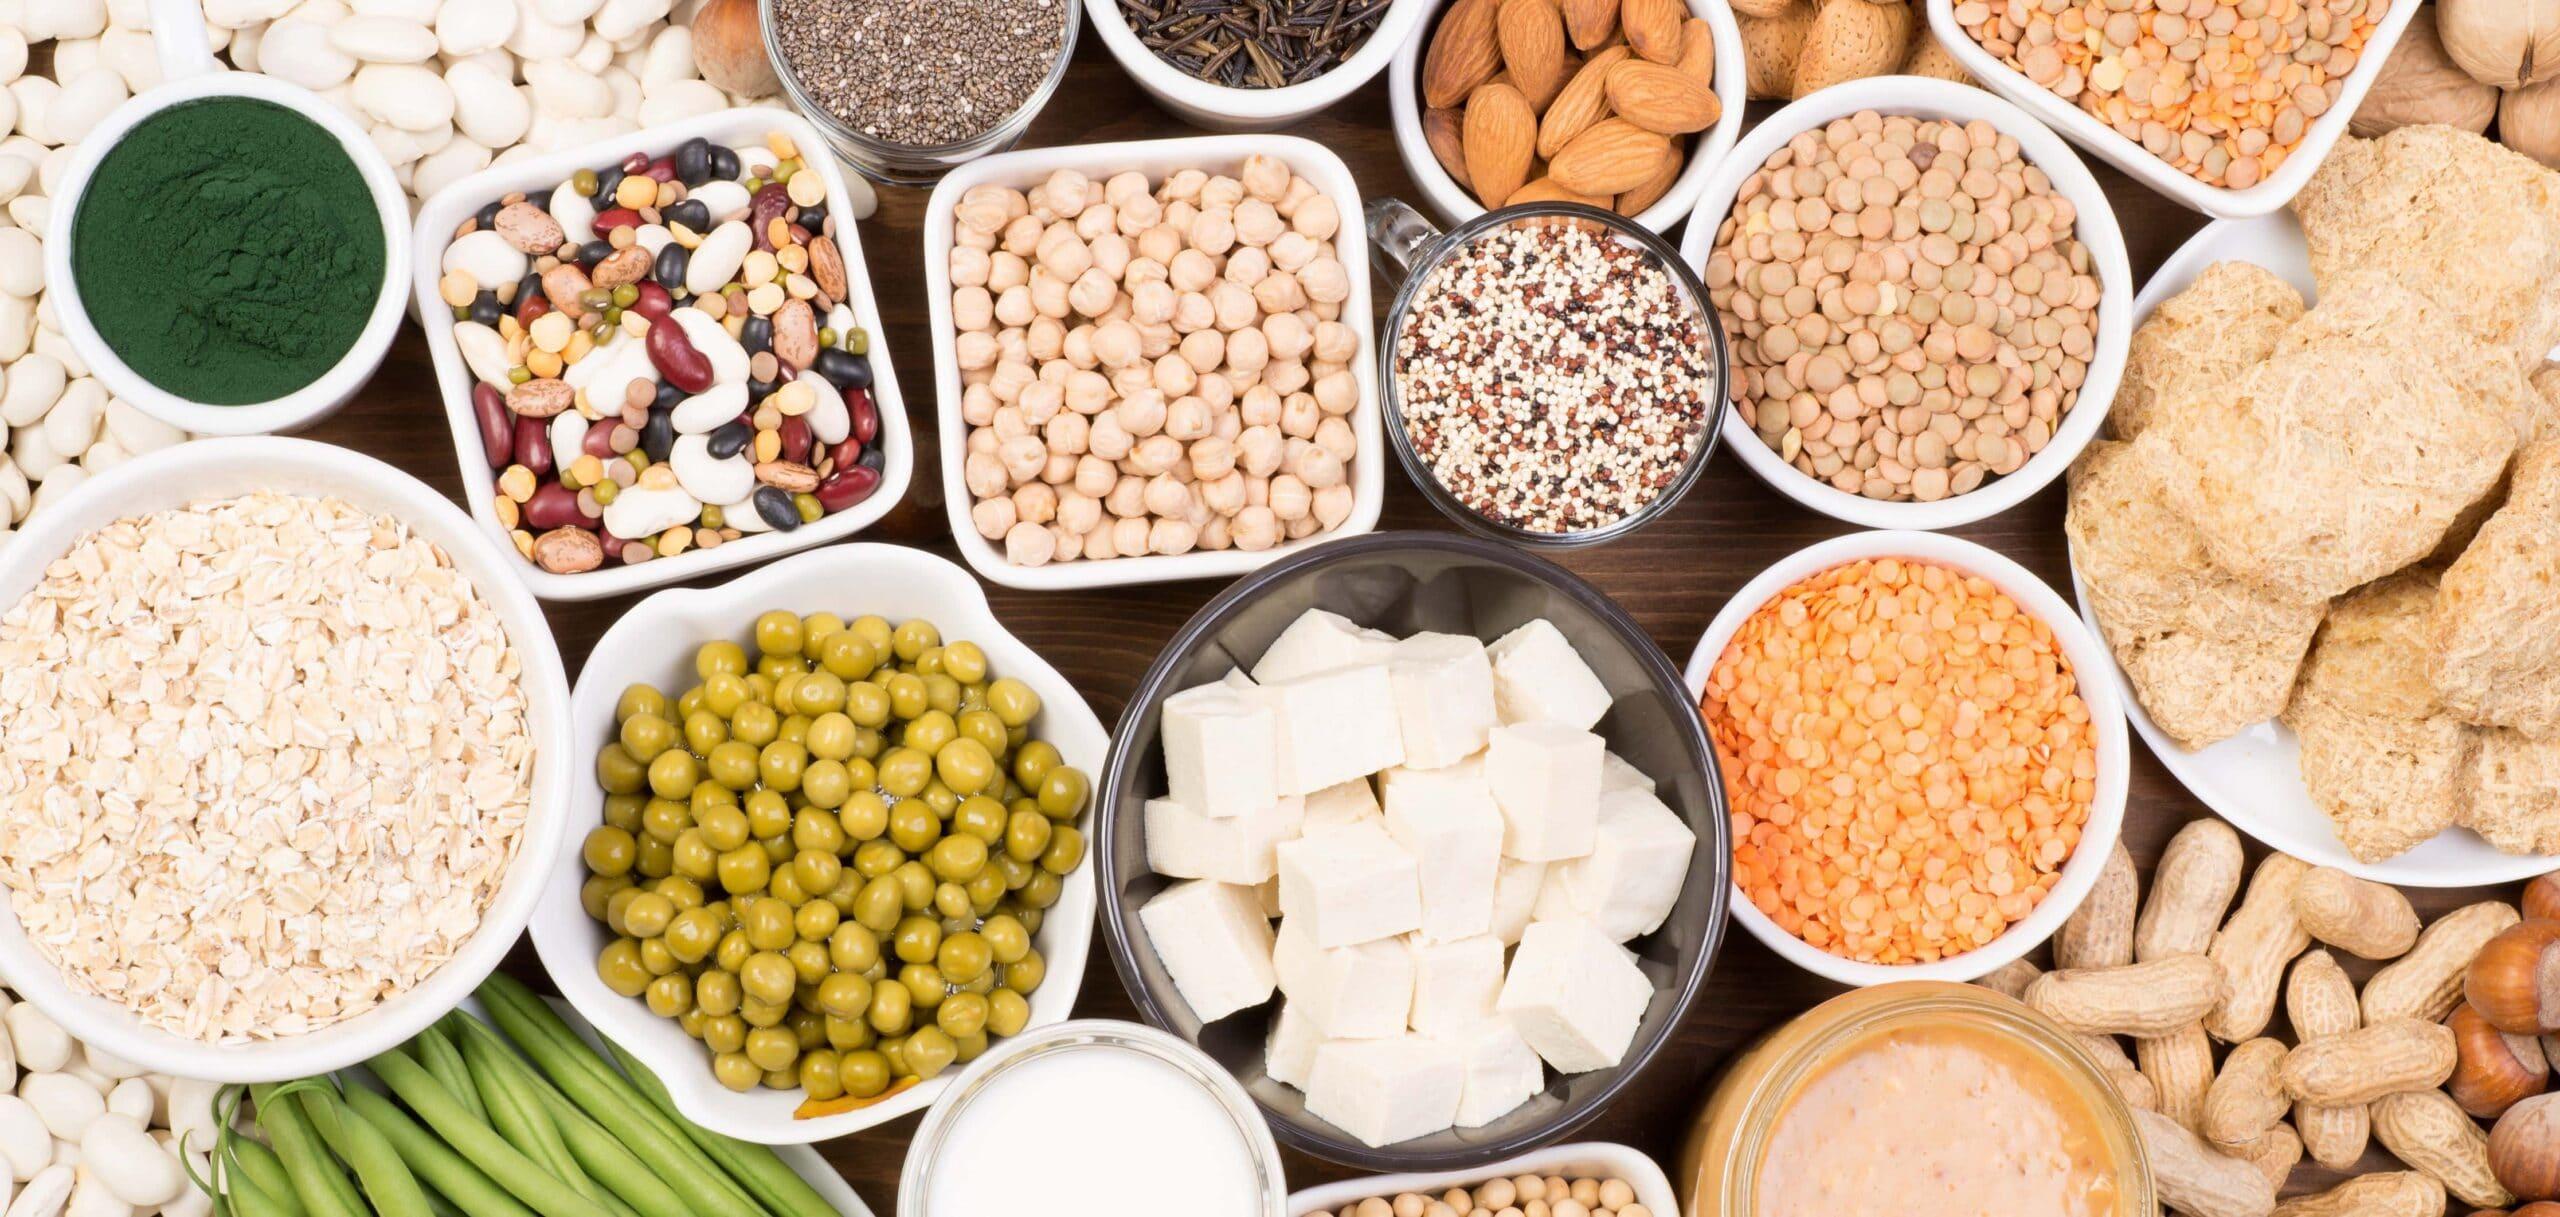 fonti alimentari proteine vegane